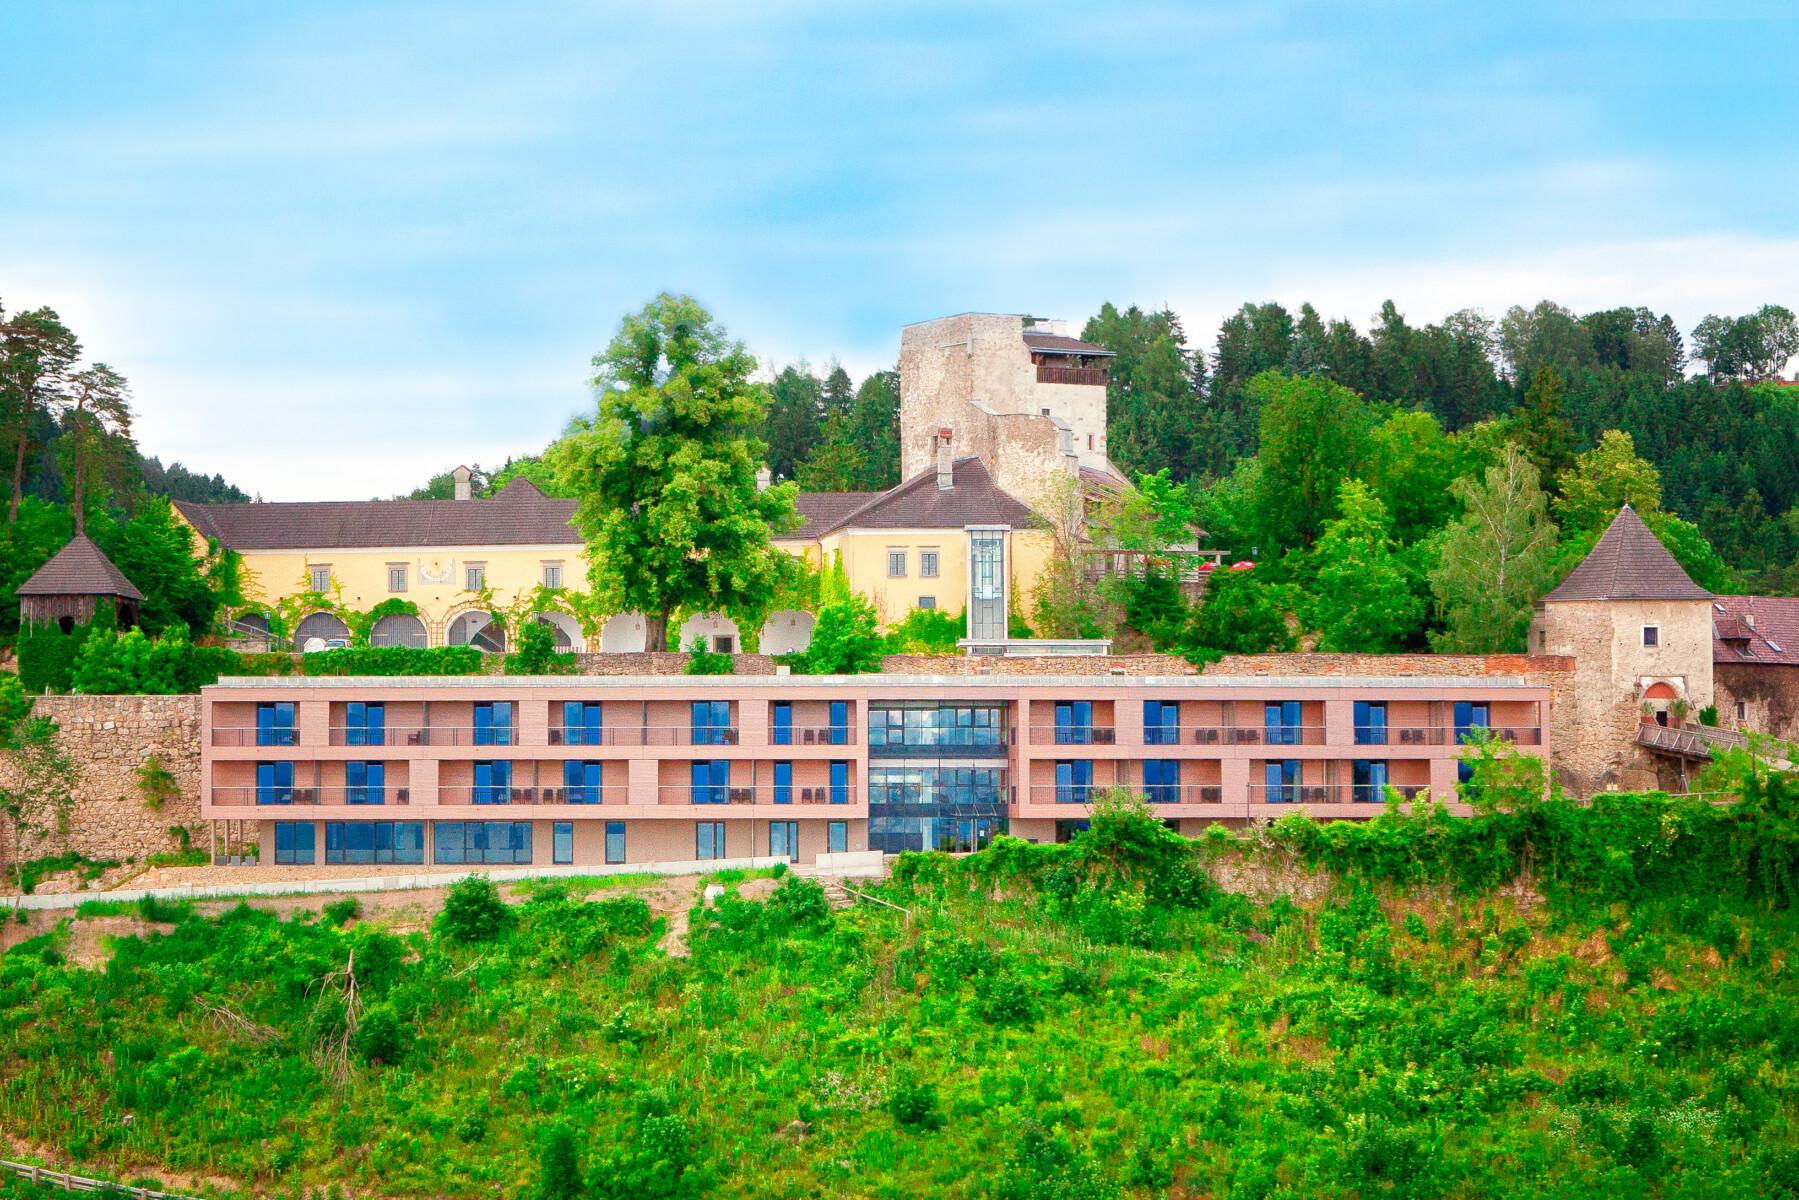 Panorama-Hotel-Kreuzen